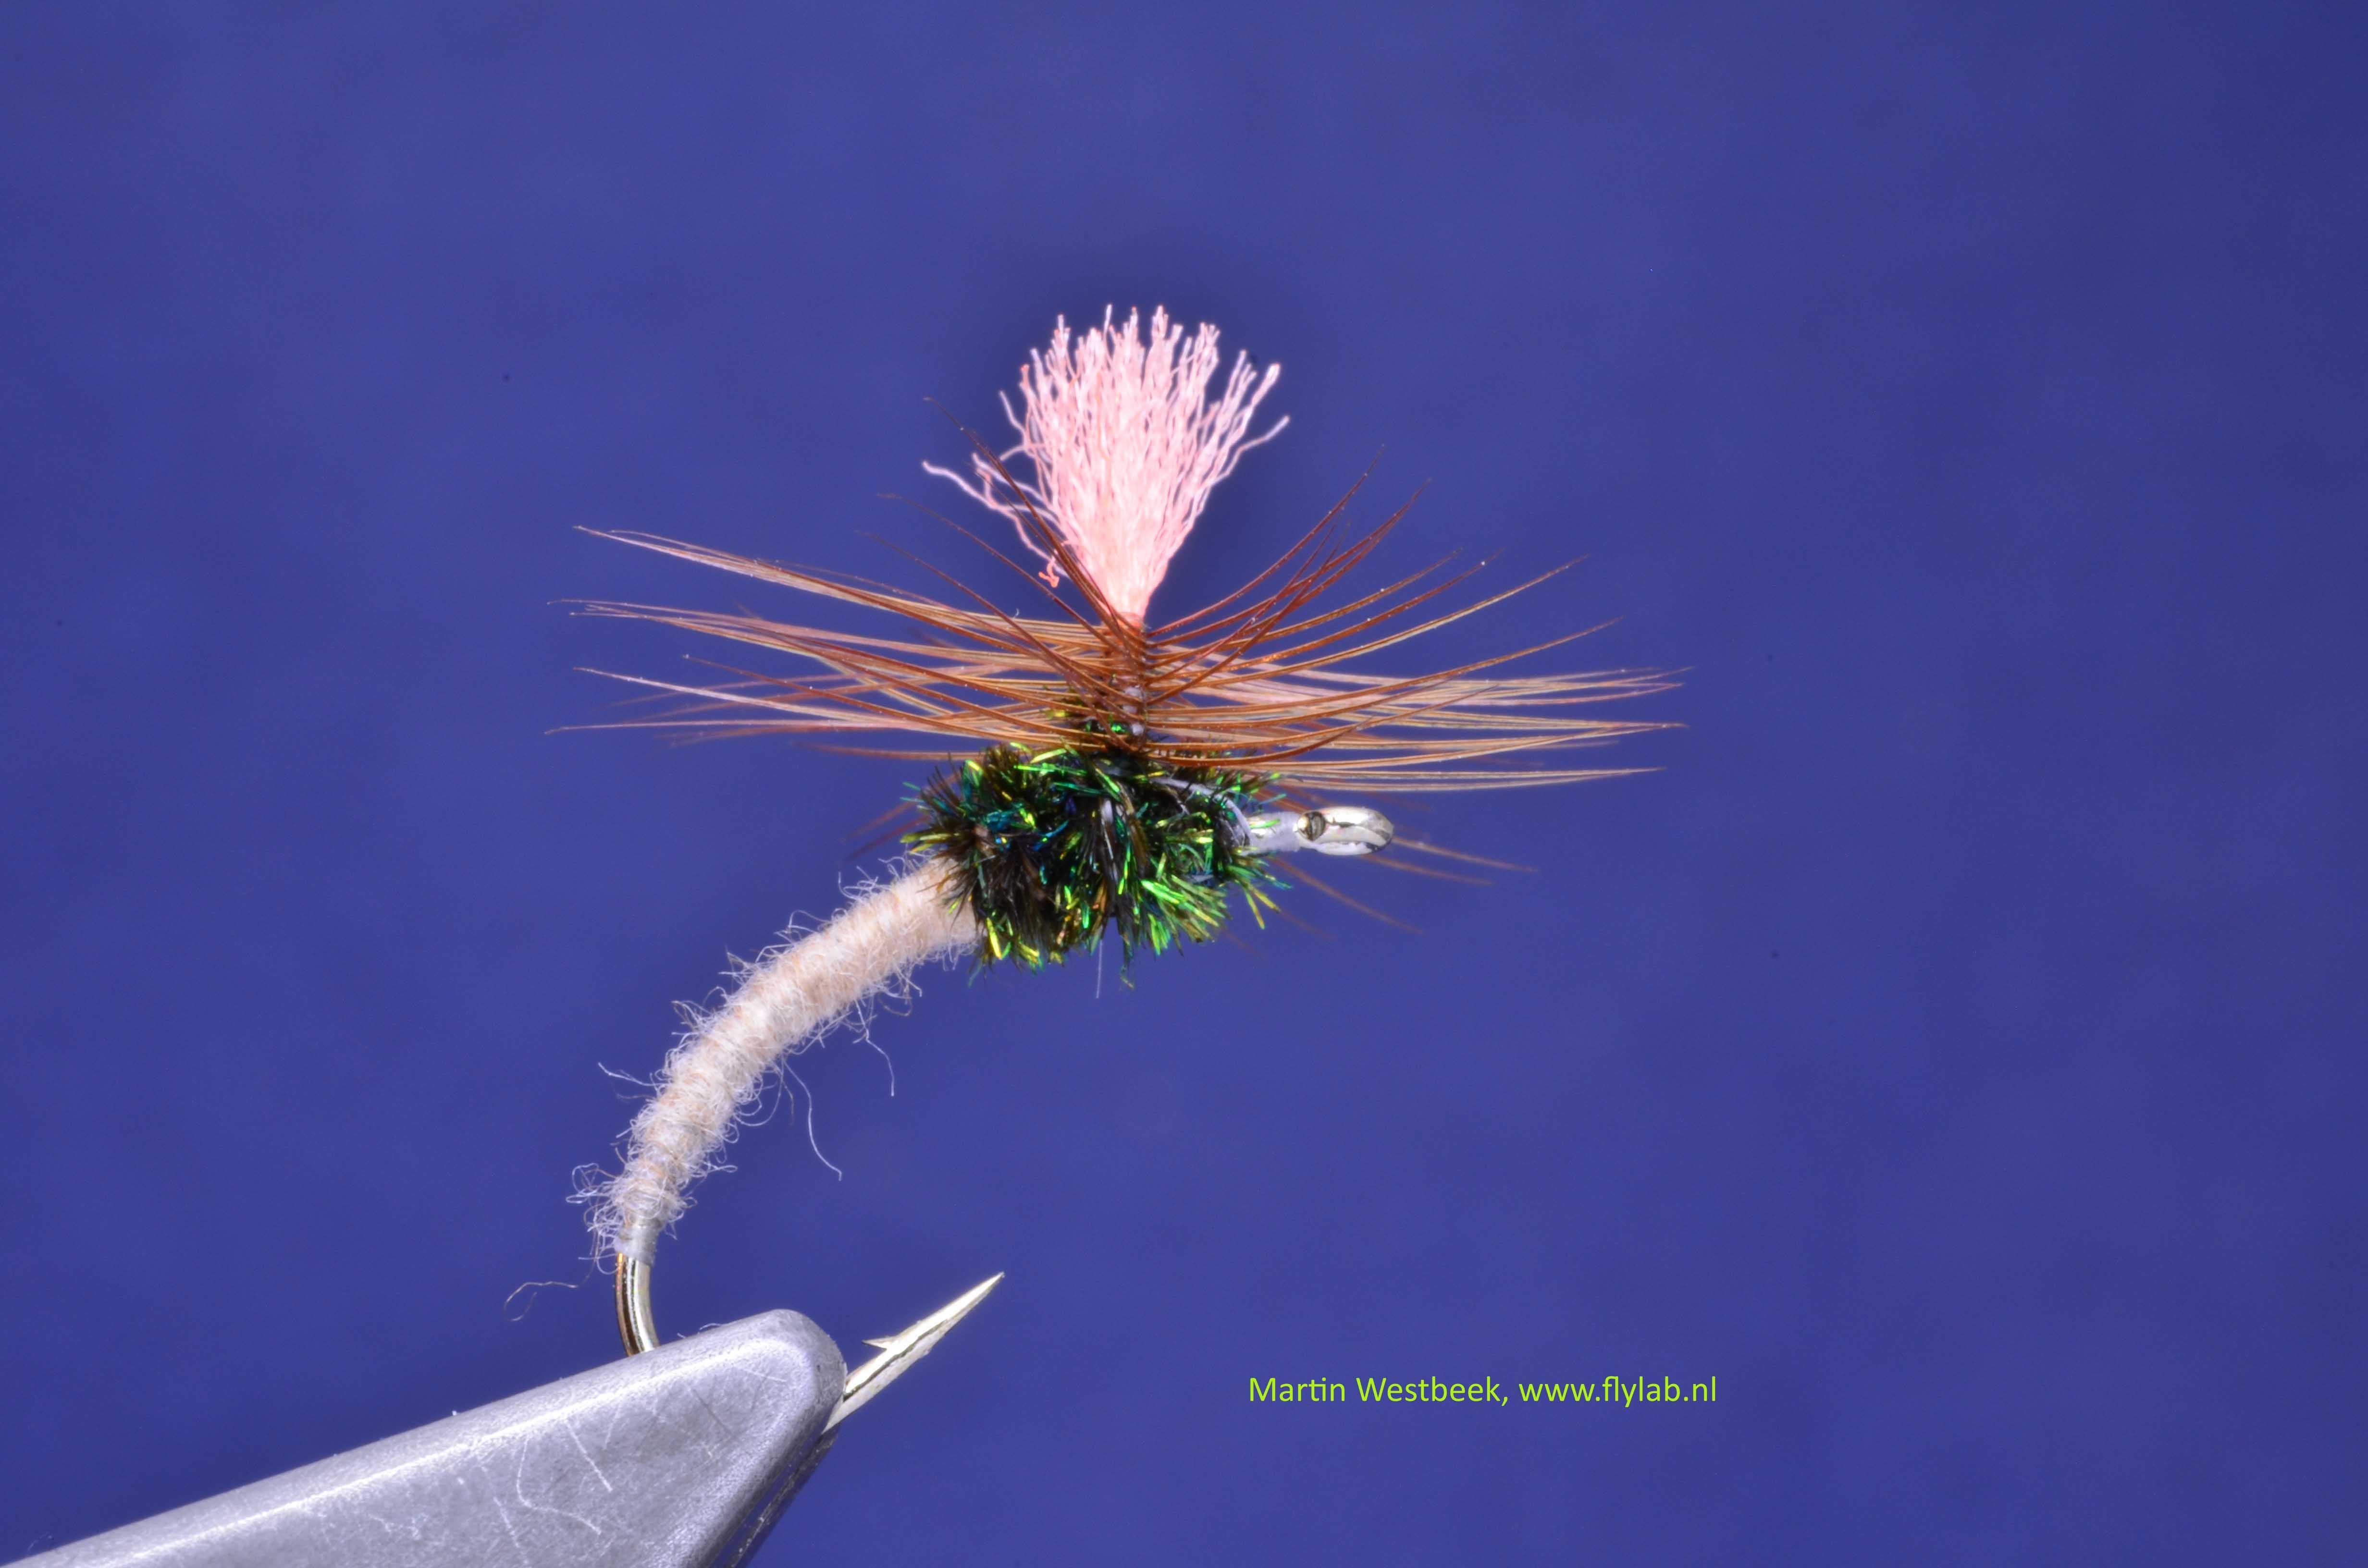 HiVisKlinkhammersmallwebs